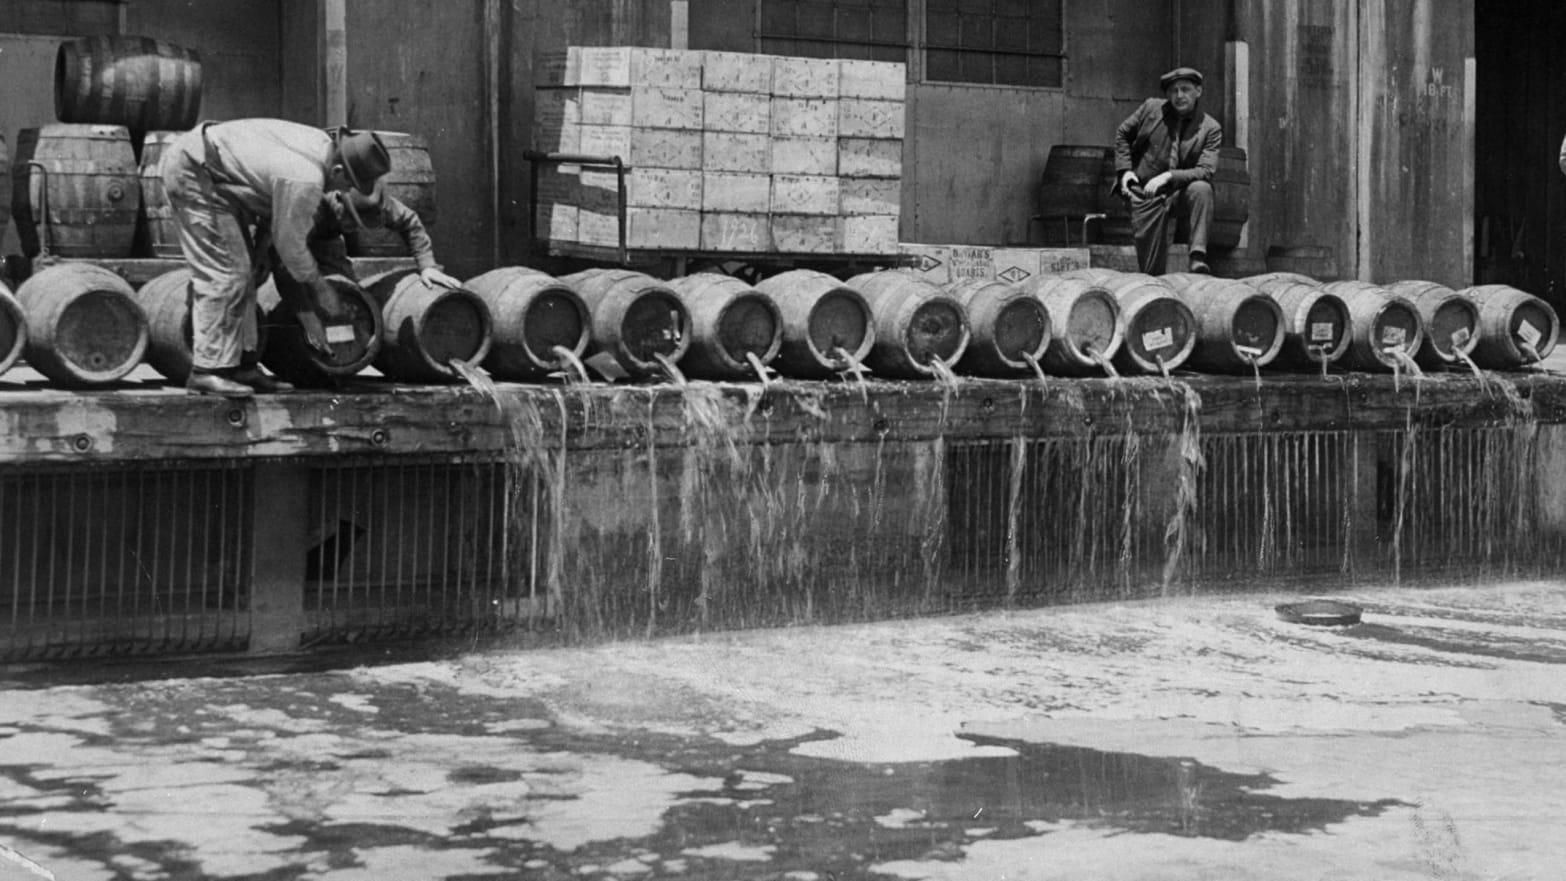 181017-rothbaum-prohibition-tease-1_ielzqu.jpg